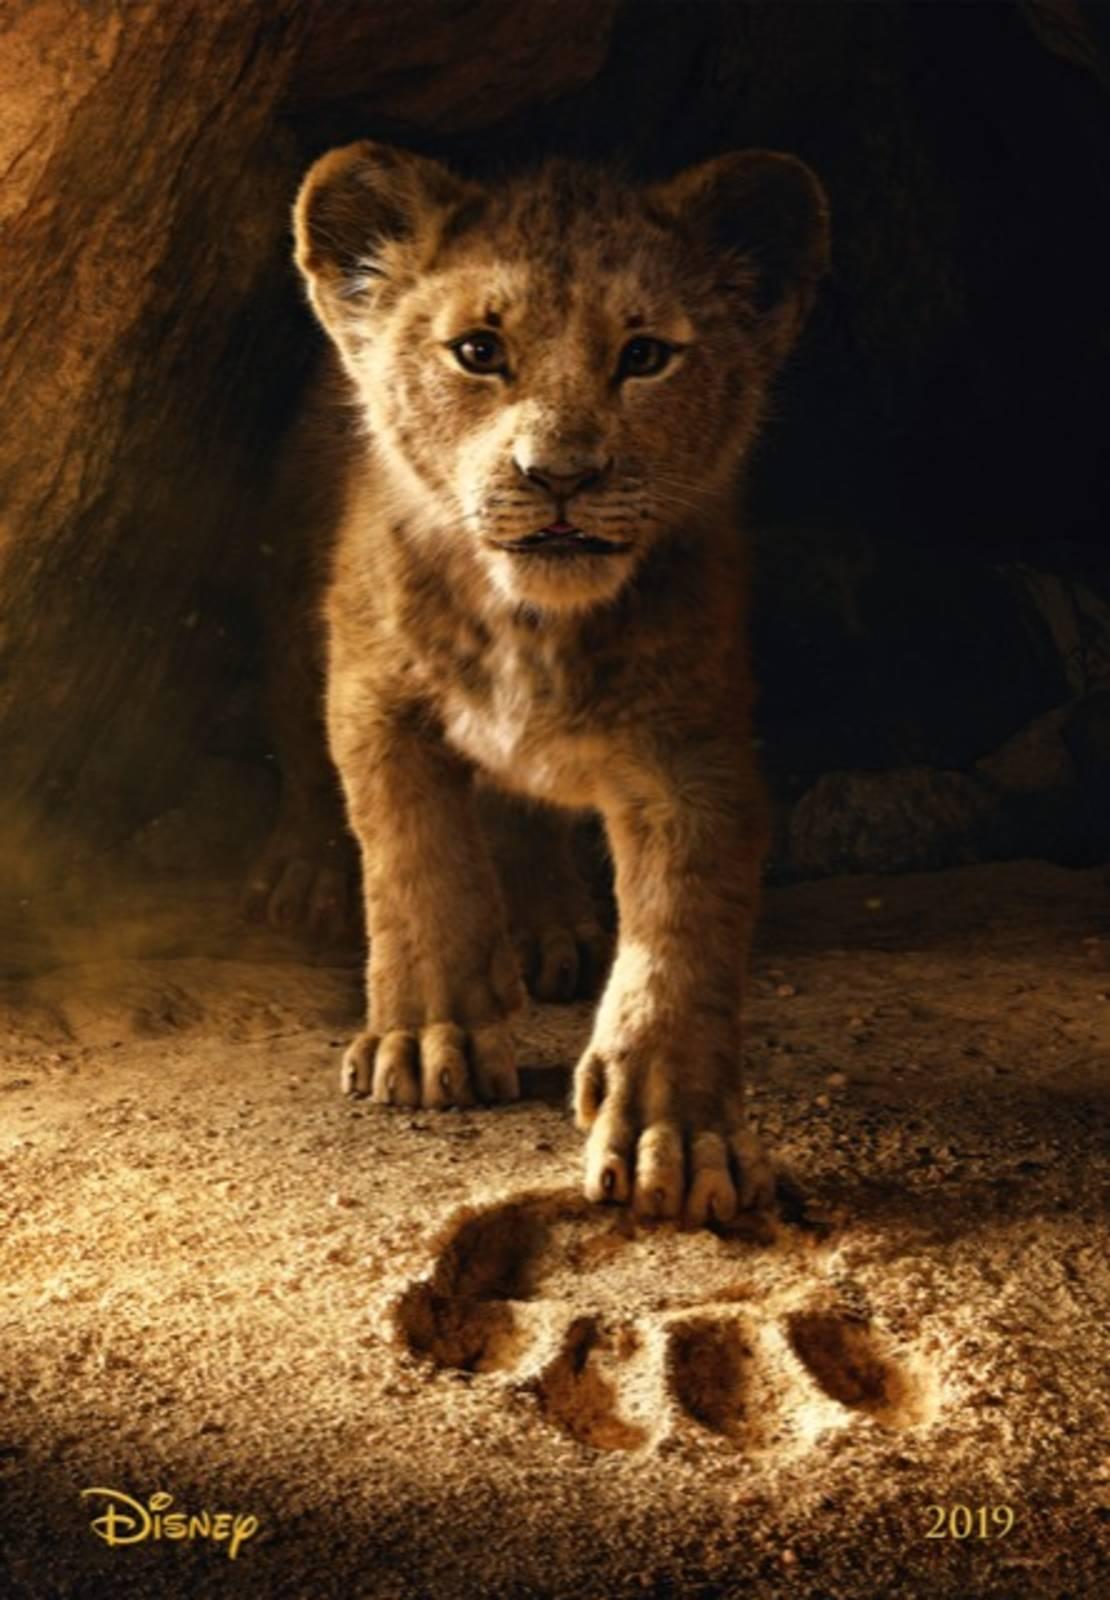 Movie The Lion King Cineman